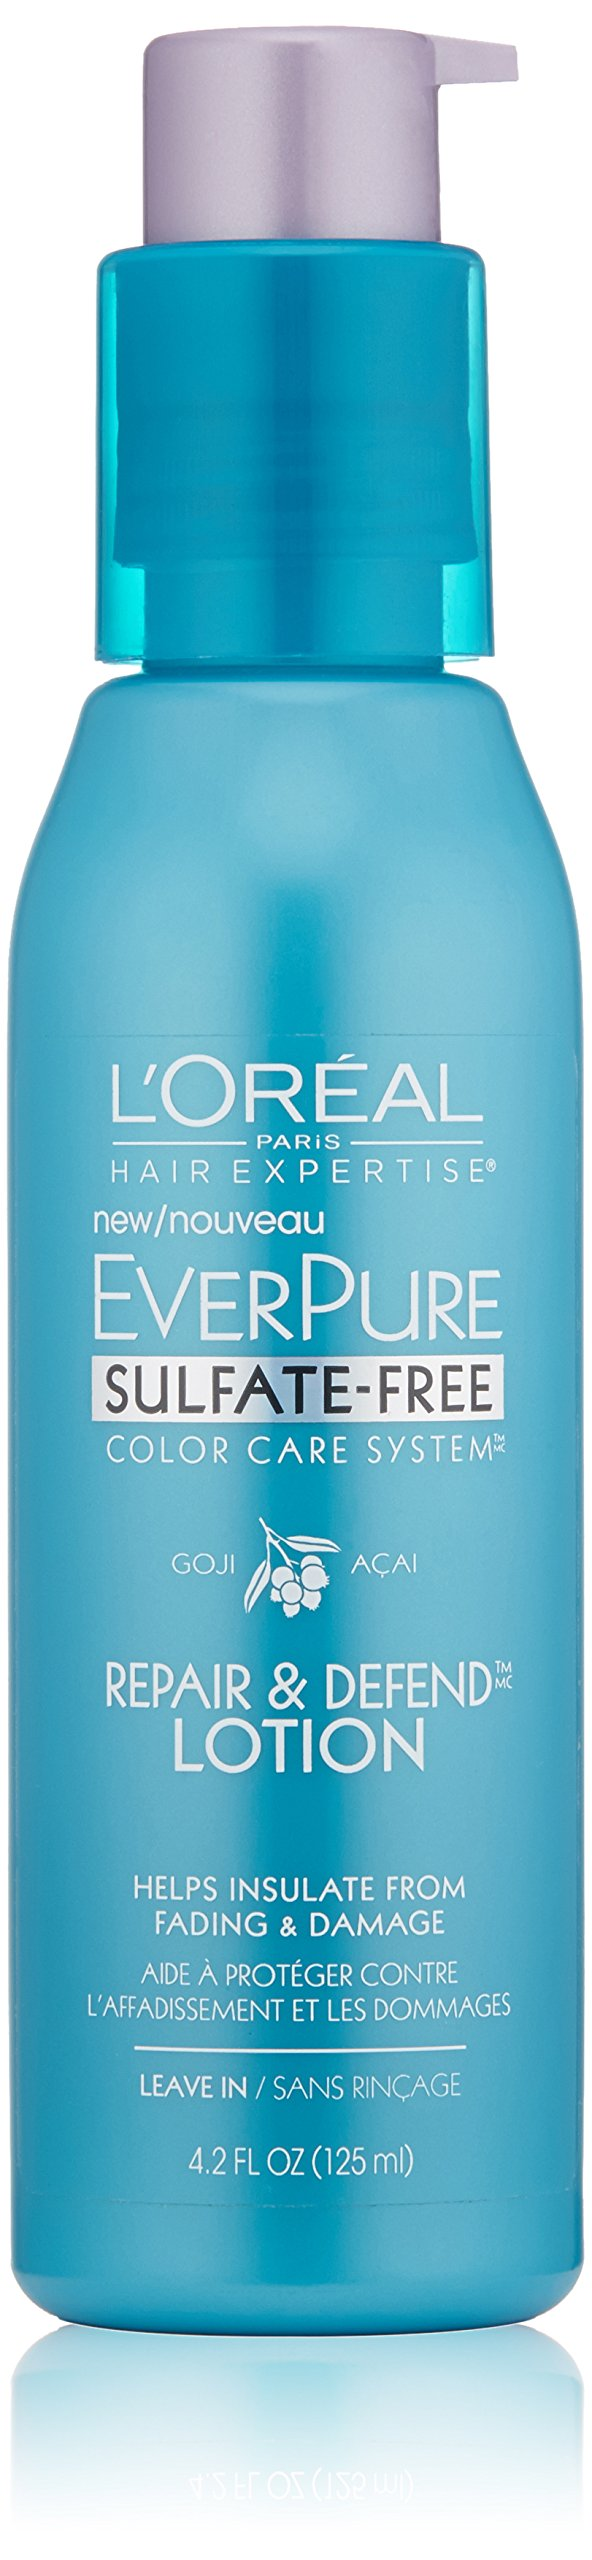 L'Oreal Paris Hair Care Expertise Everpure Repair and Defend Leave in Treat